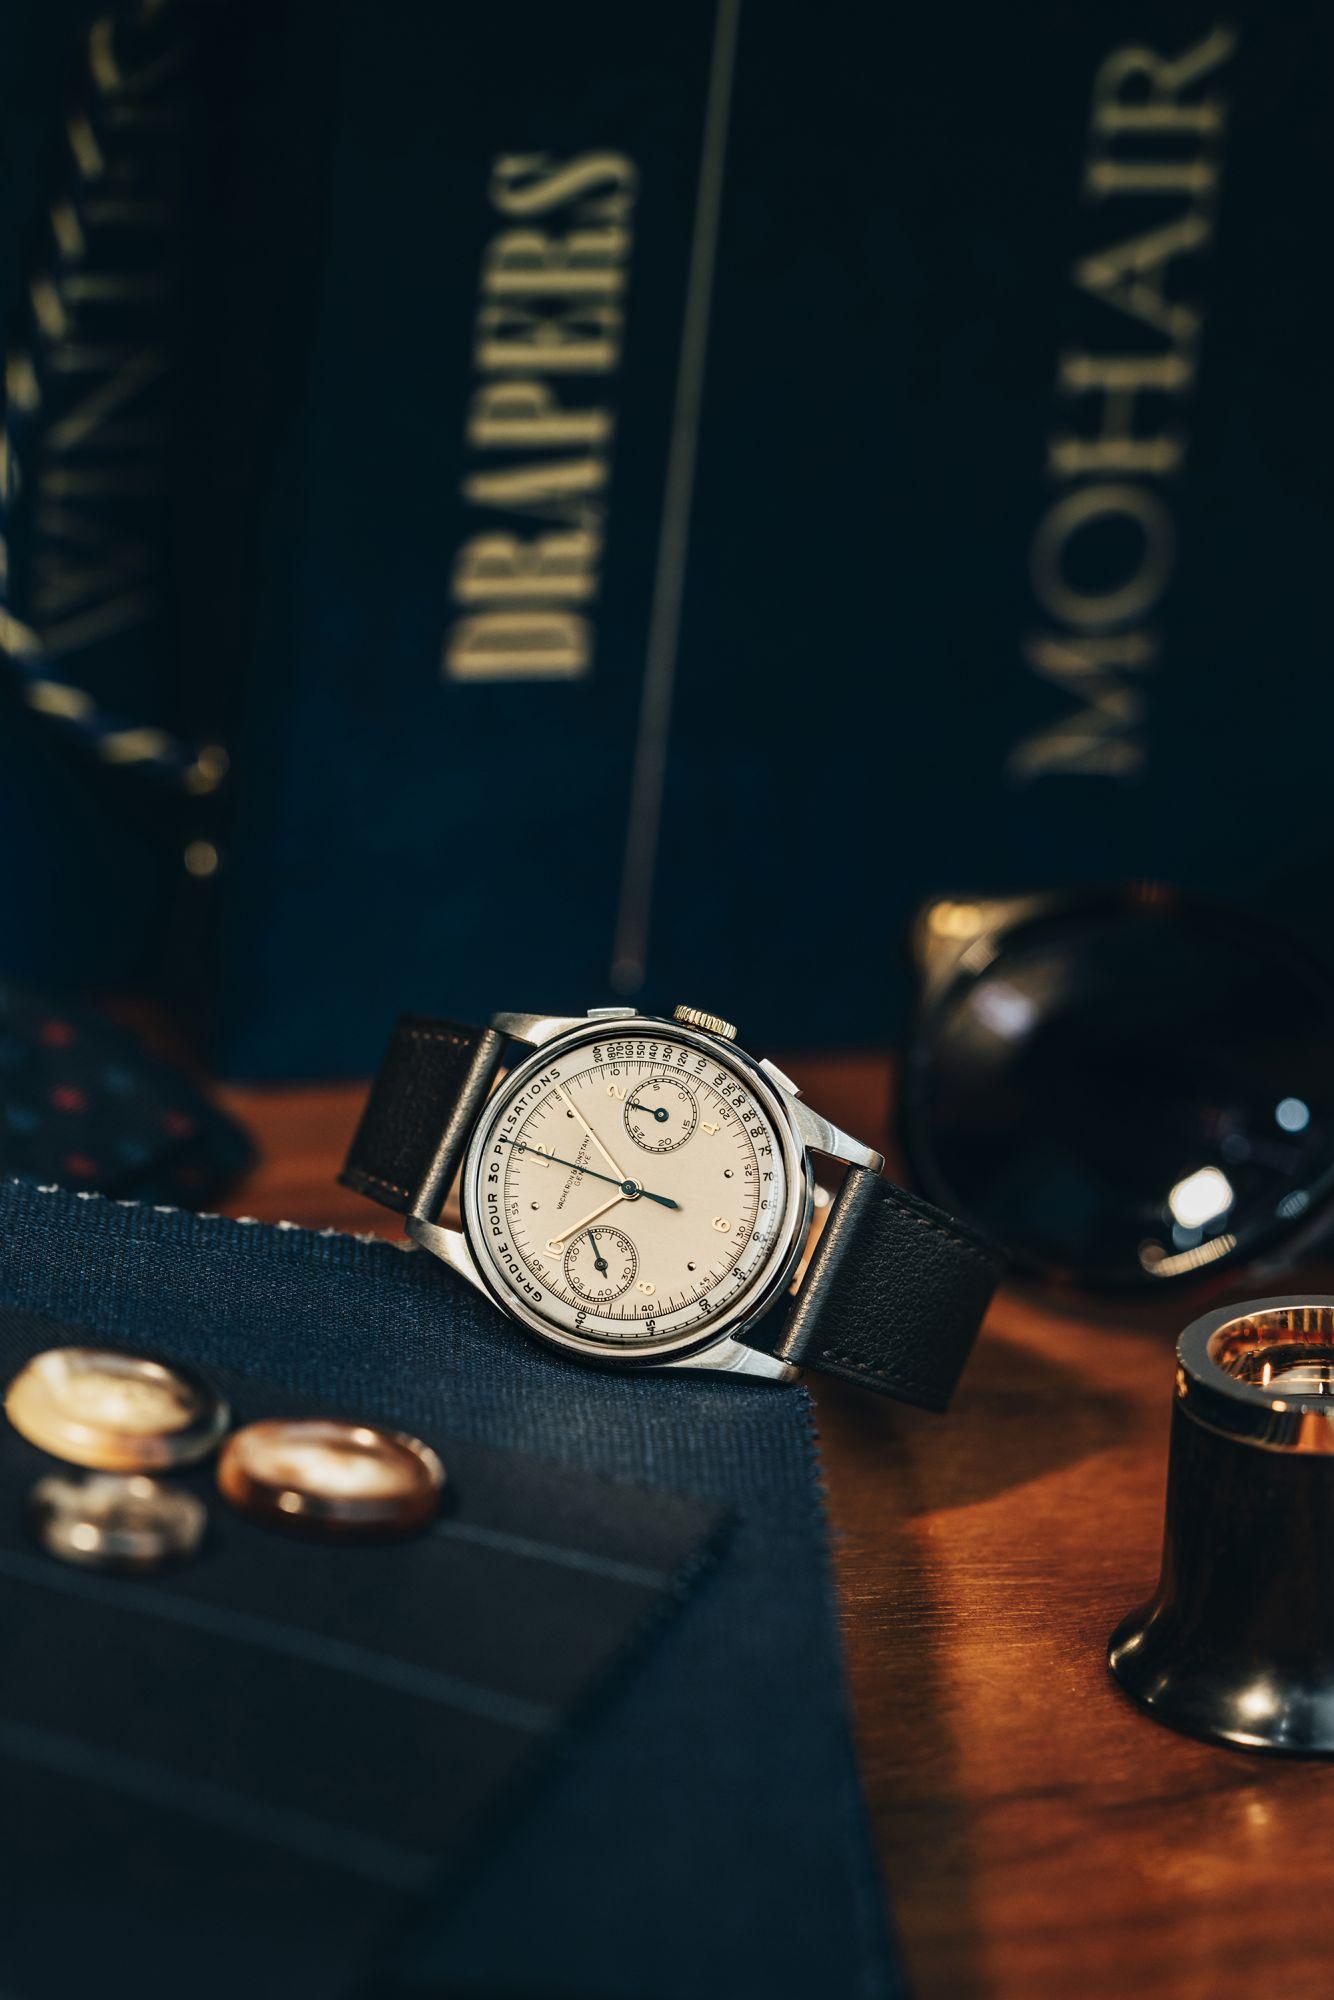 Vacheron Constantin's Very First Chronograph Pocket Watch Comes To Hong Kong